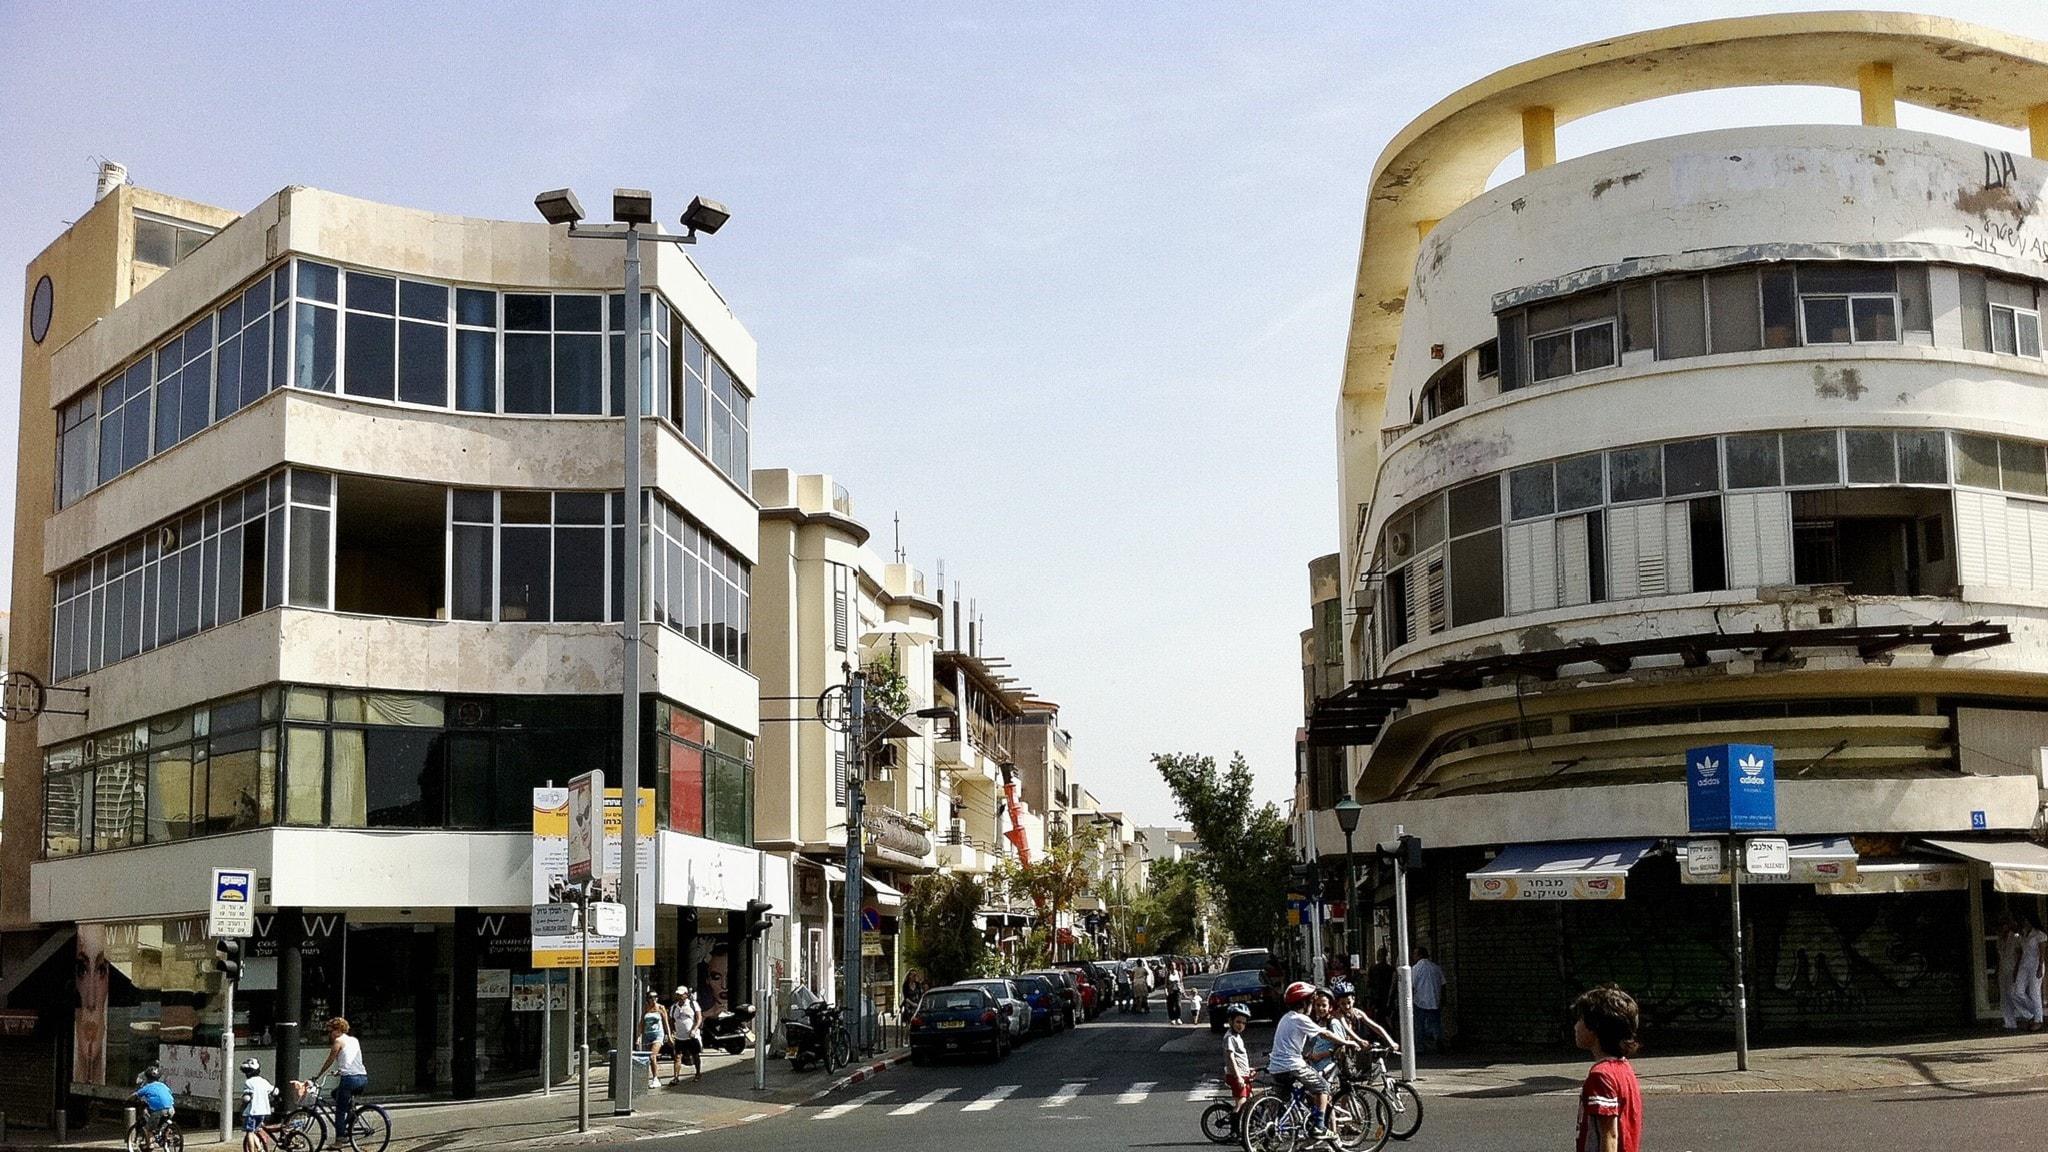 Bauhaus 100 år – Modernism utan minnen i Tel Aviv